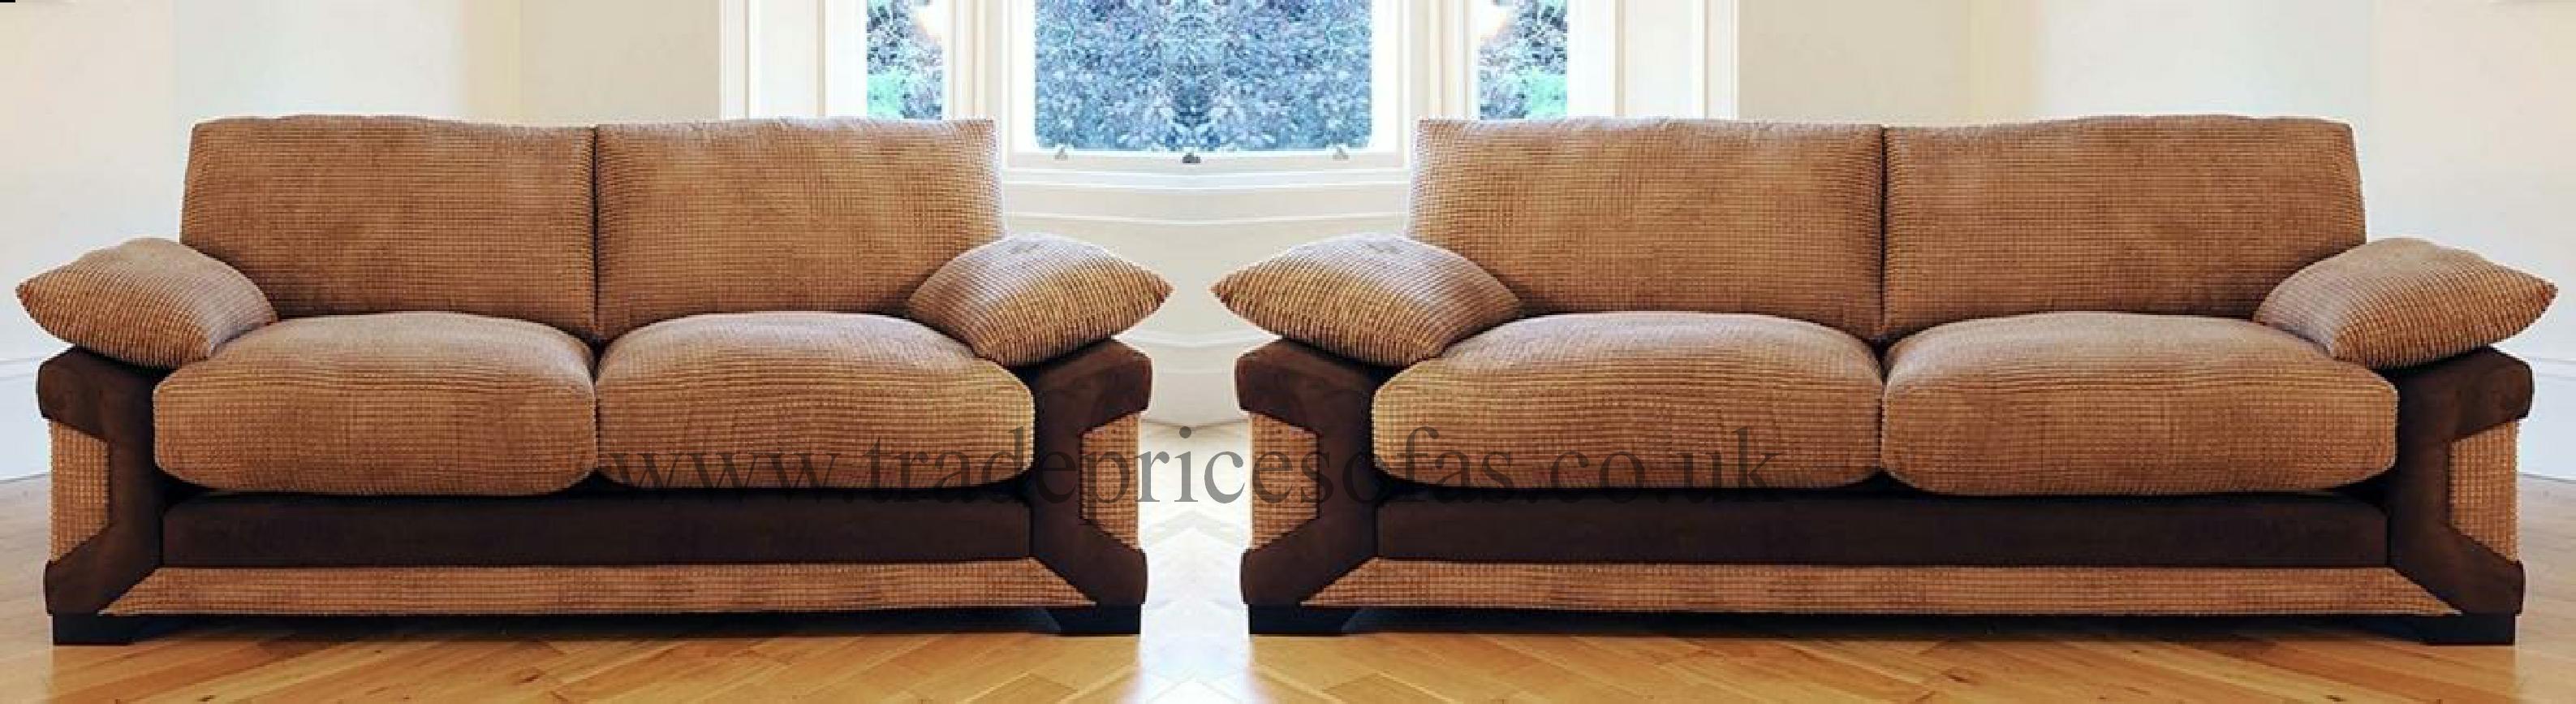 Dino Broken Cord Arm Chair (Mocha/Grey)  https://www.tradepricefurniture.co.uk/dino-broken-cord-arm-chair-mocha-grey.html